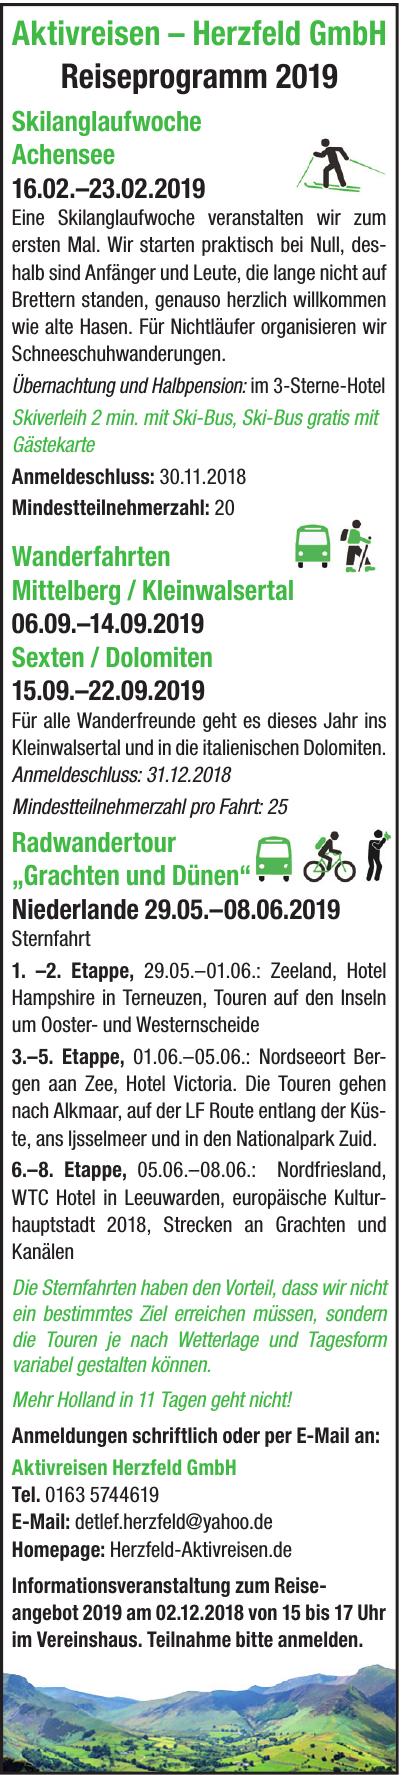 Aktivreisen Herzfeld GmbH